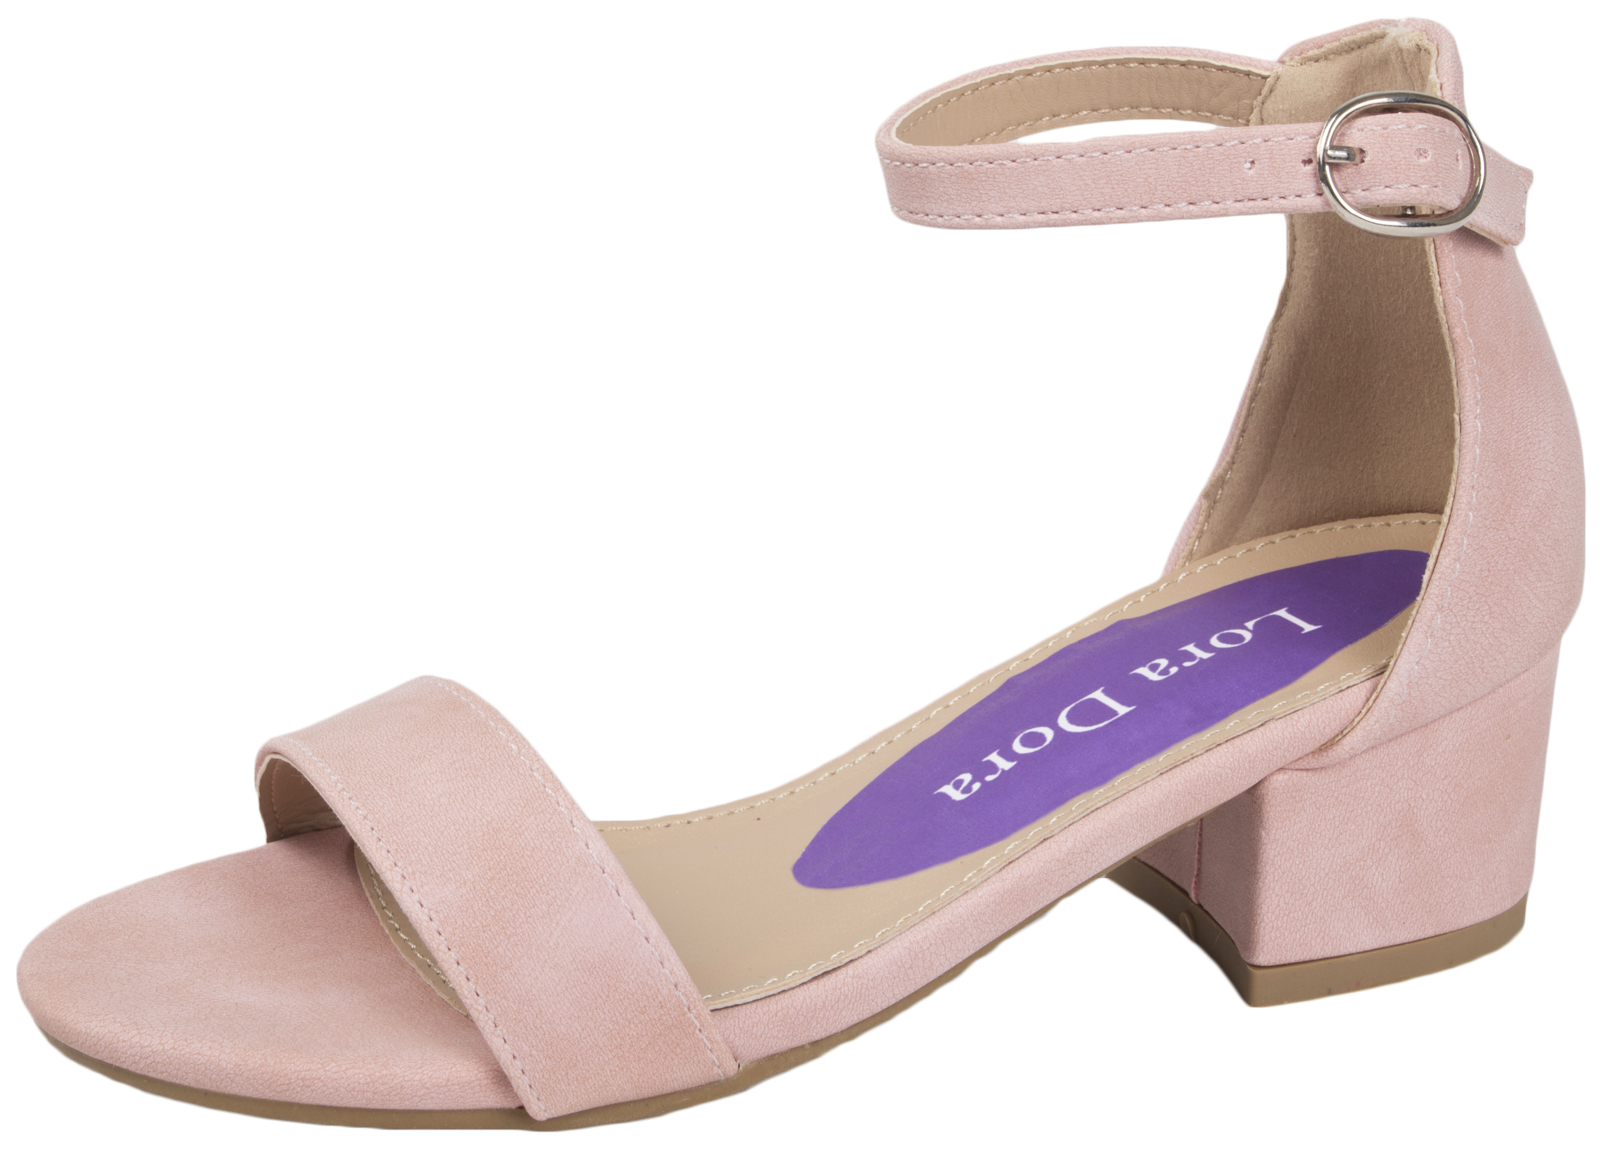 Low Heel Party Shoes Uk